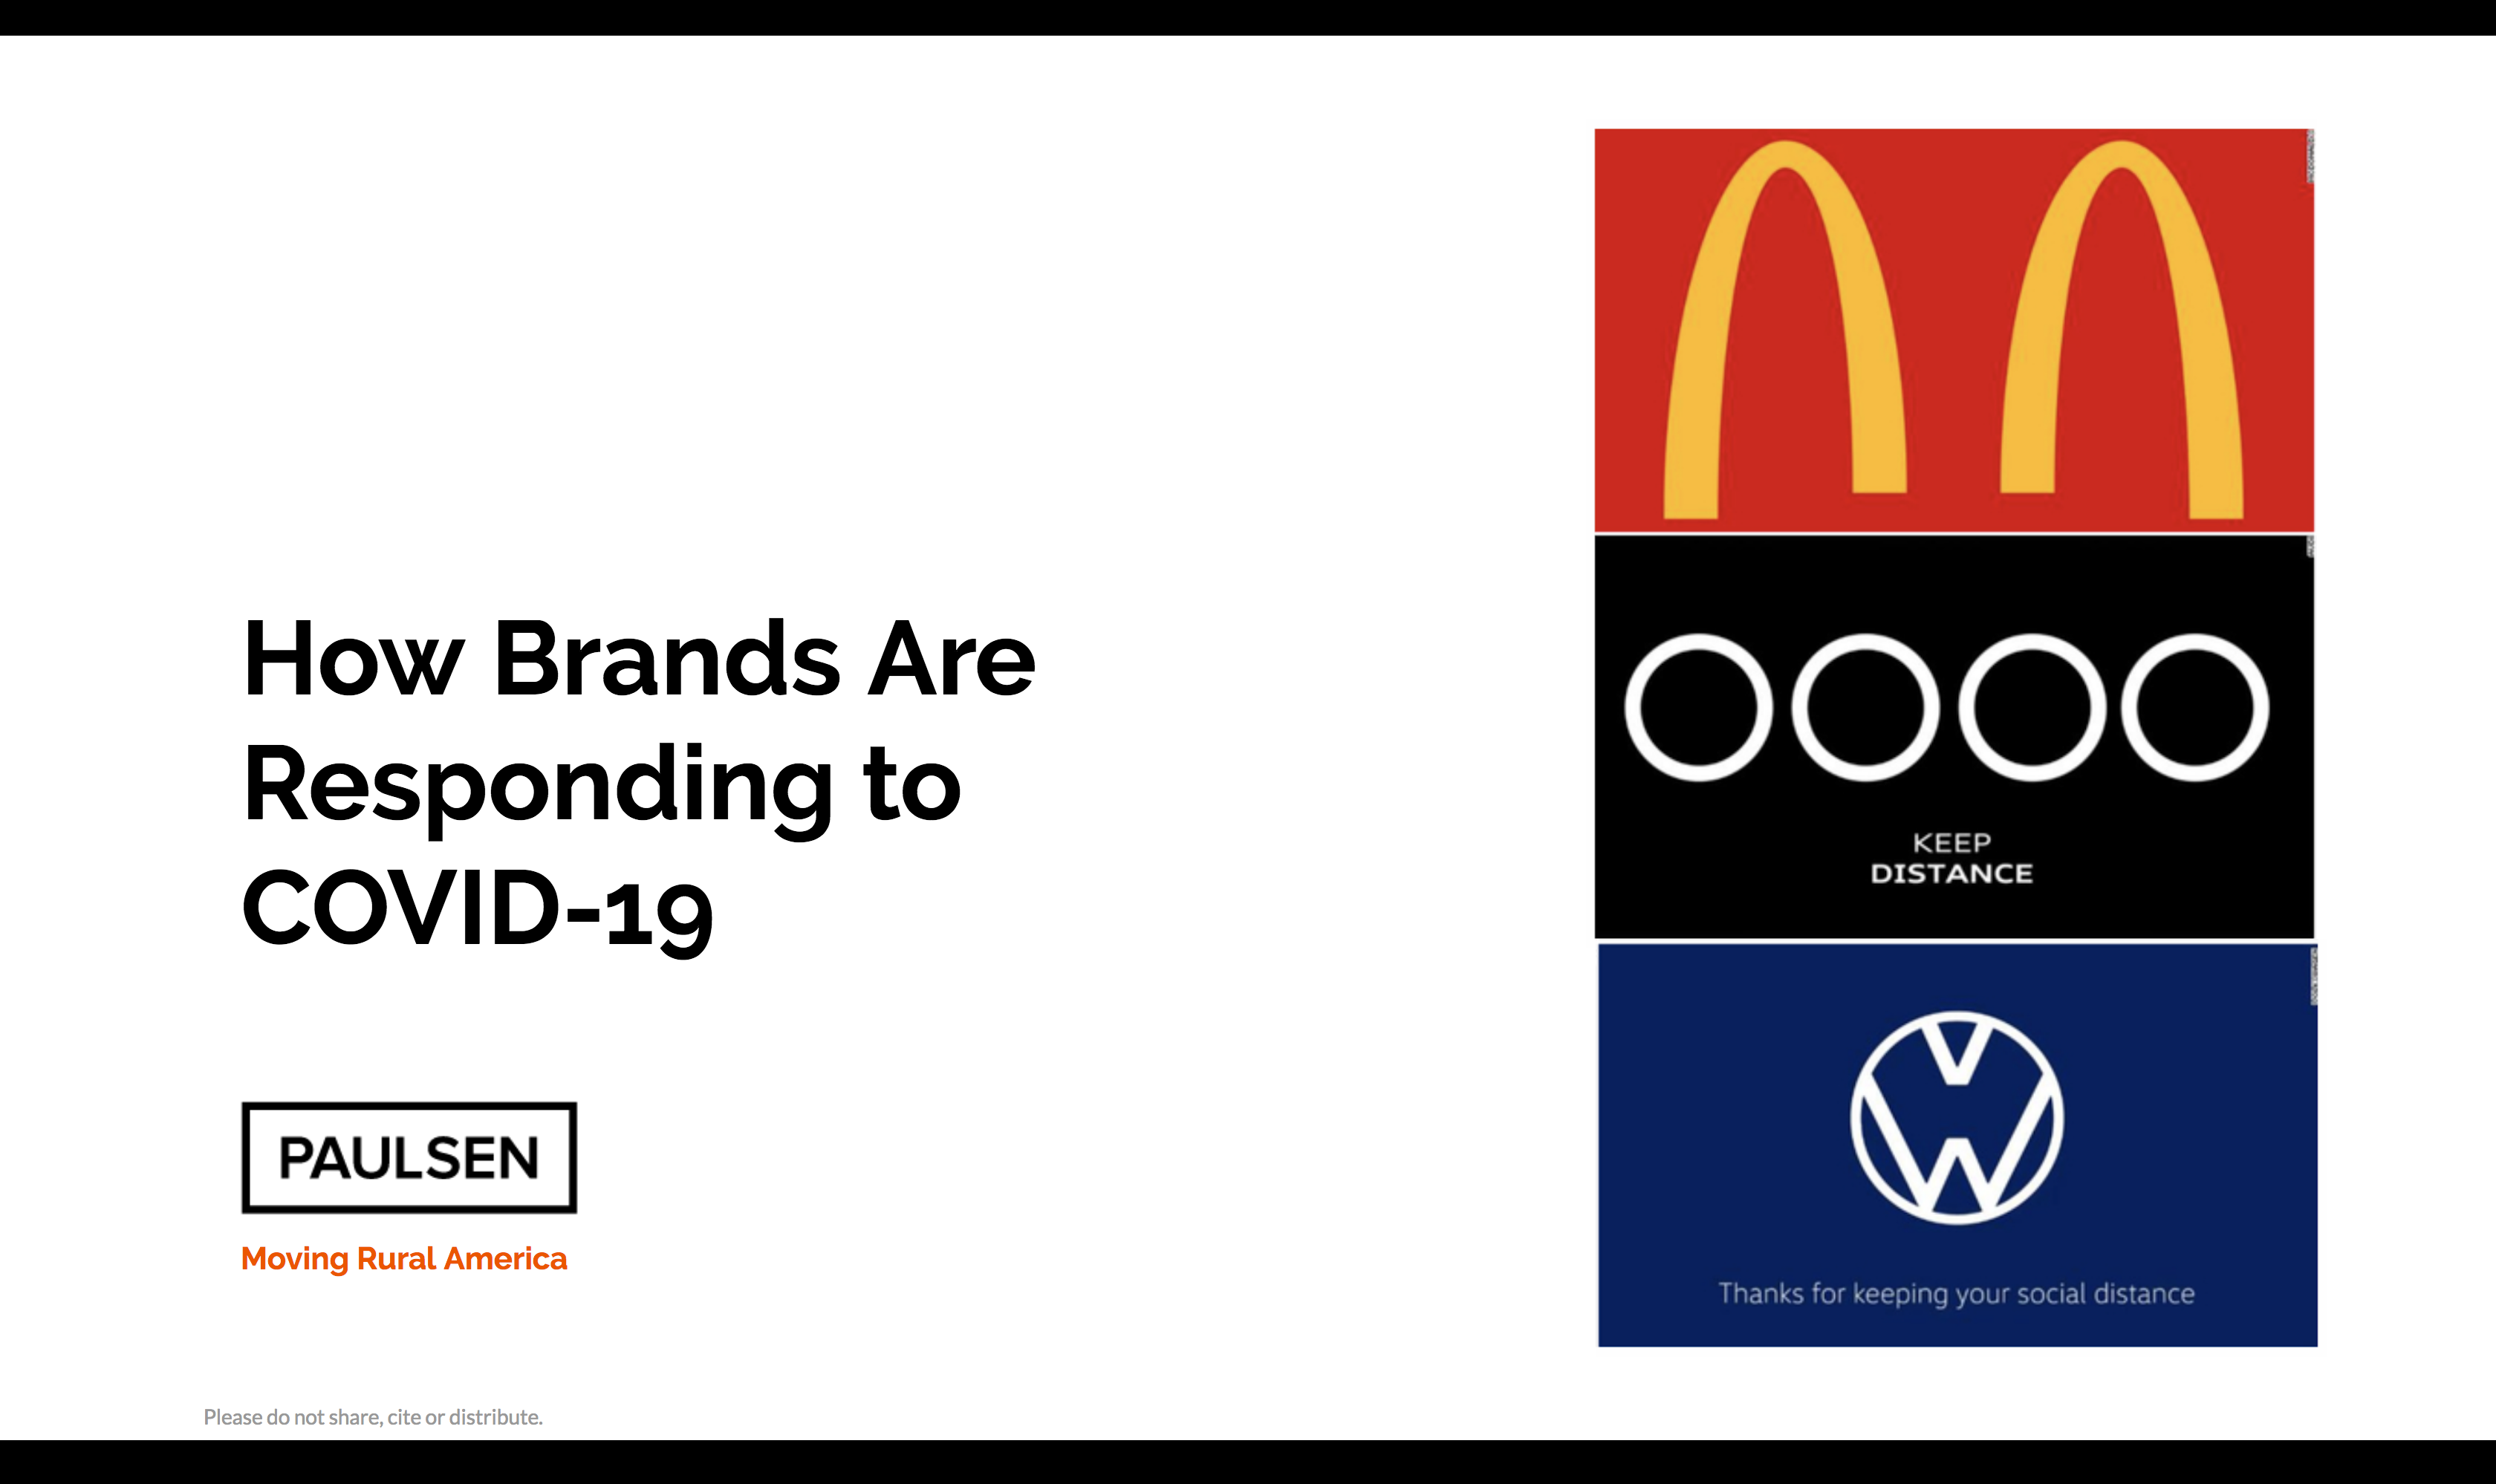 Breaking Brand Standards COVID-19